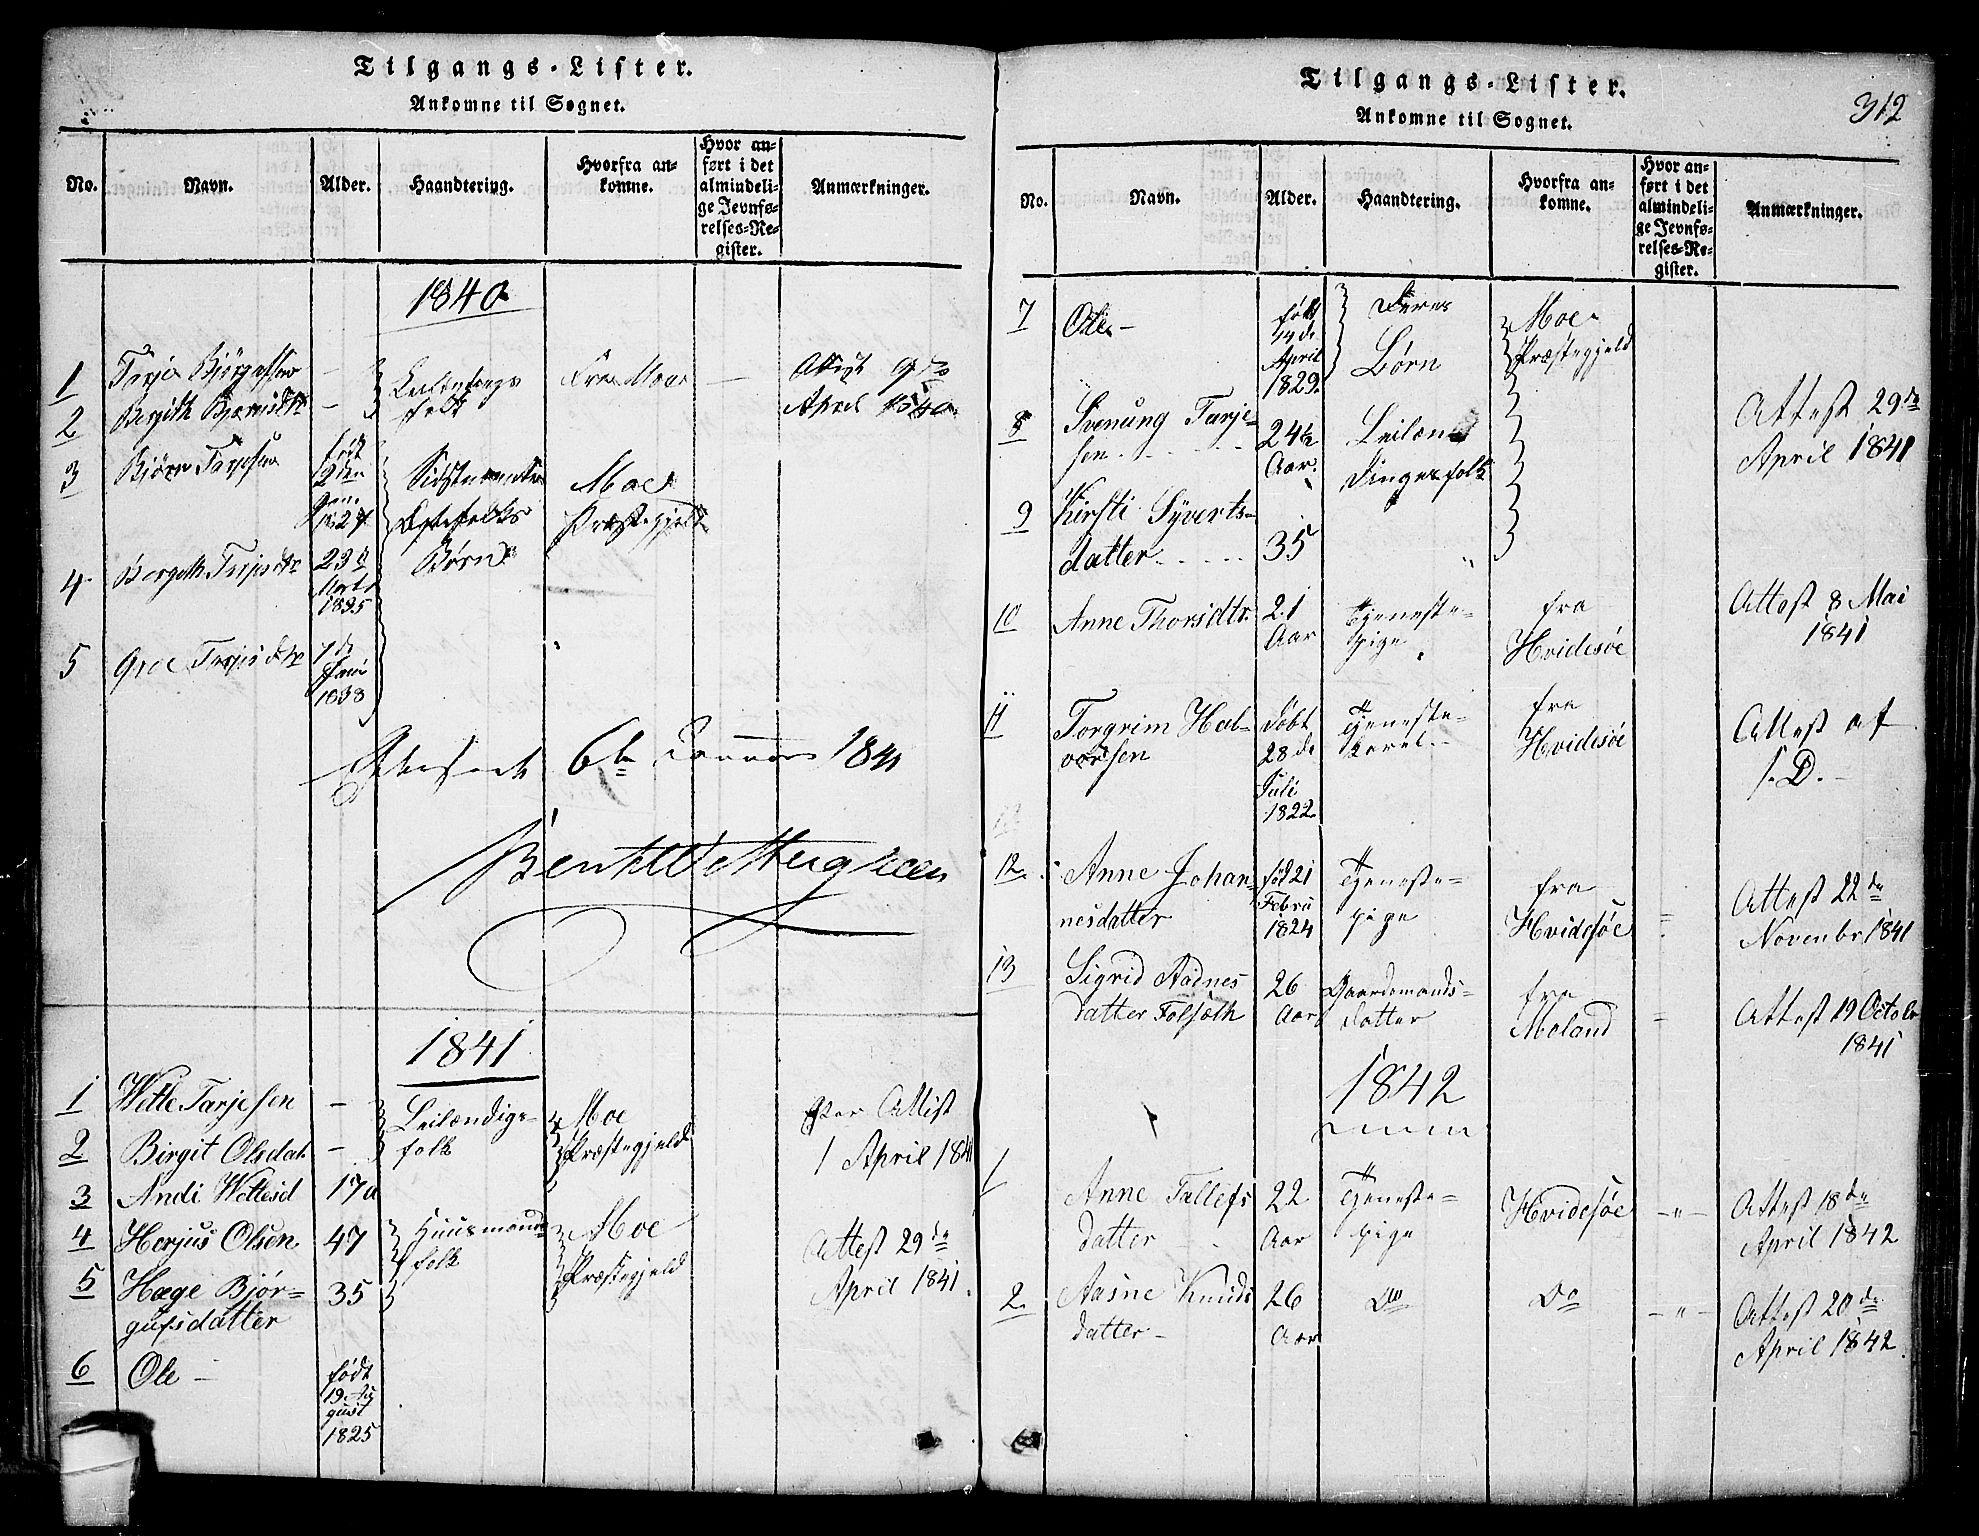 SAKO, Lårdal kirkebøker, G/Ga/L0001: Klokkerbok nr. I 1, 1815-1861, s. 312